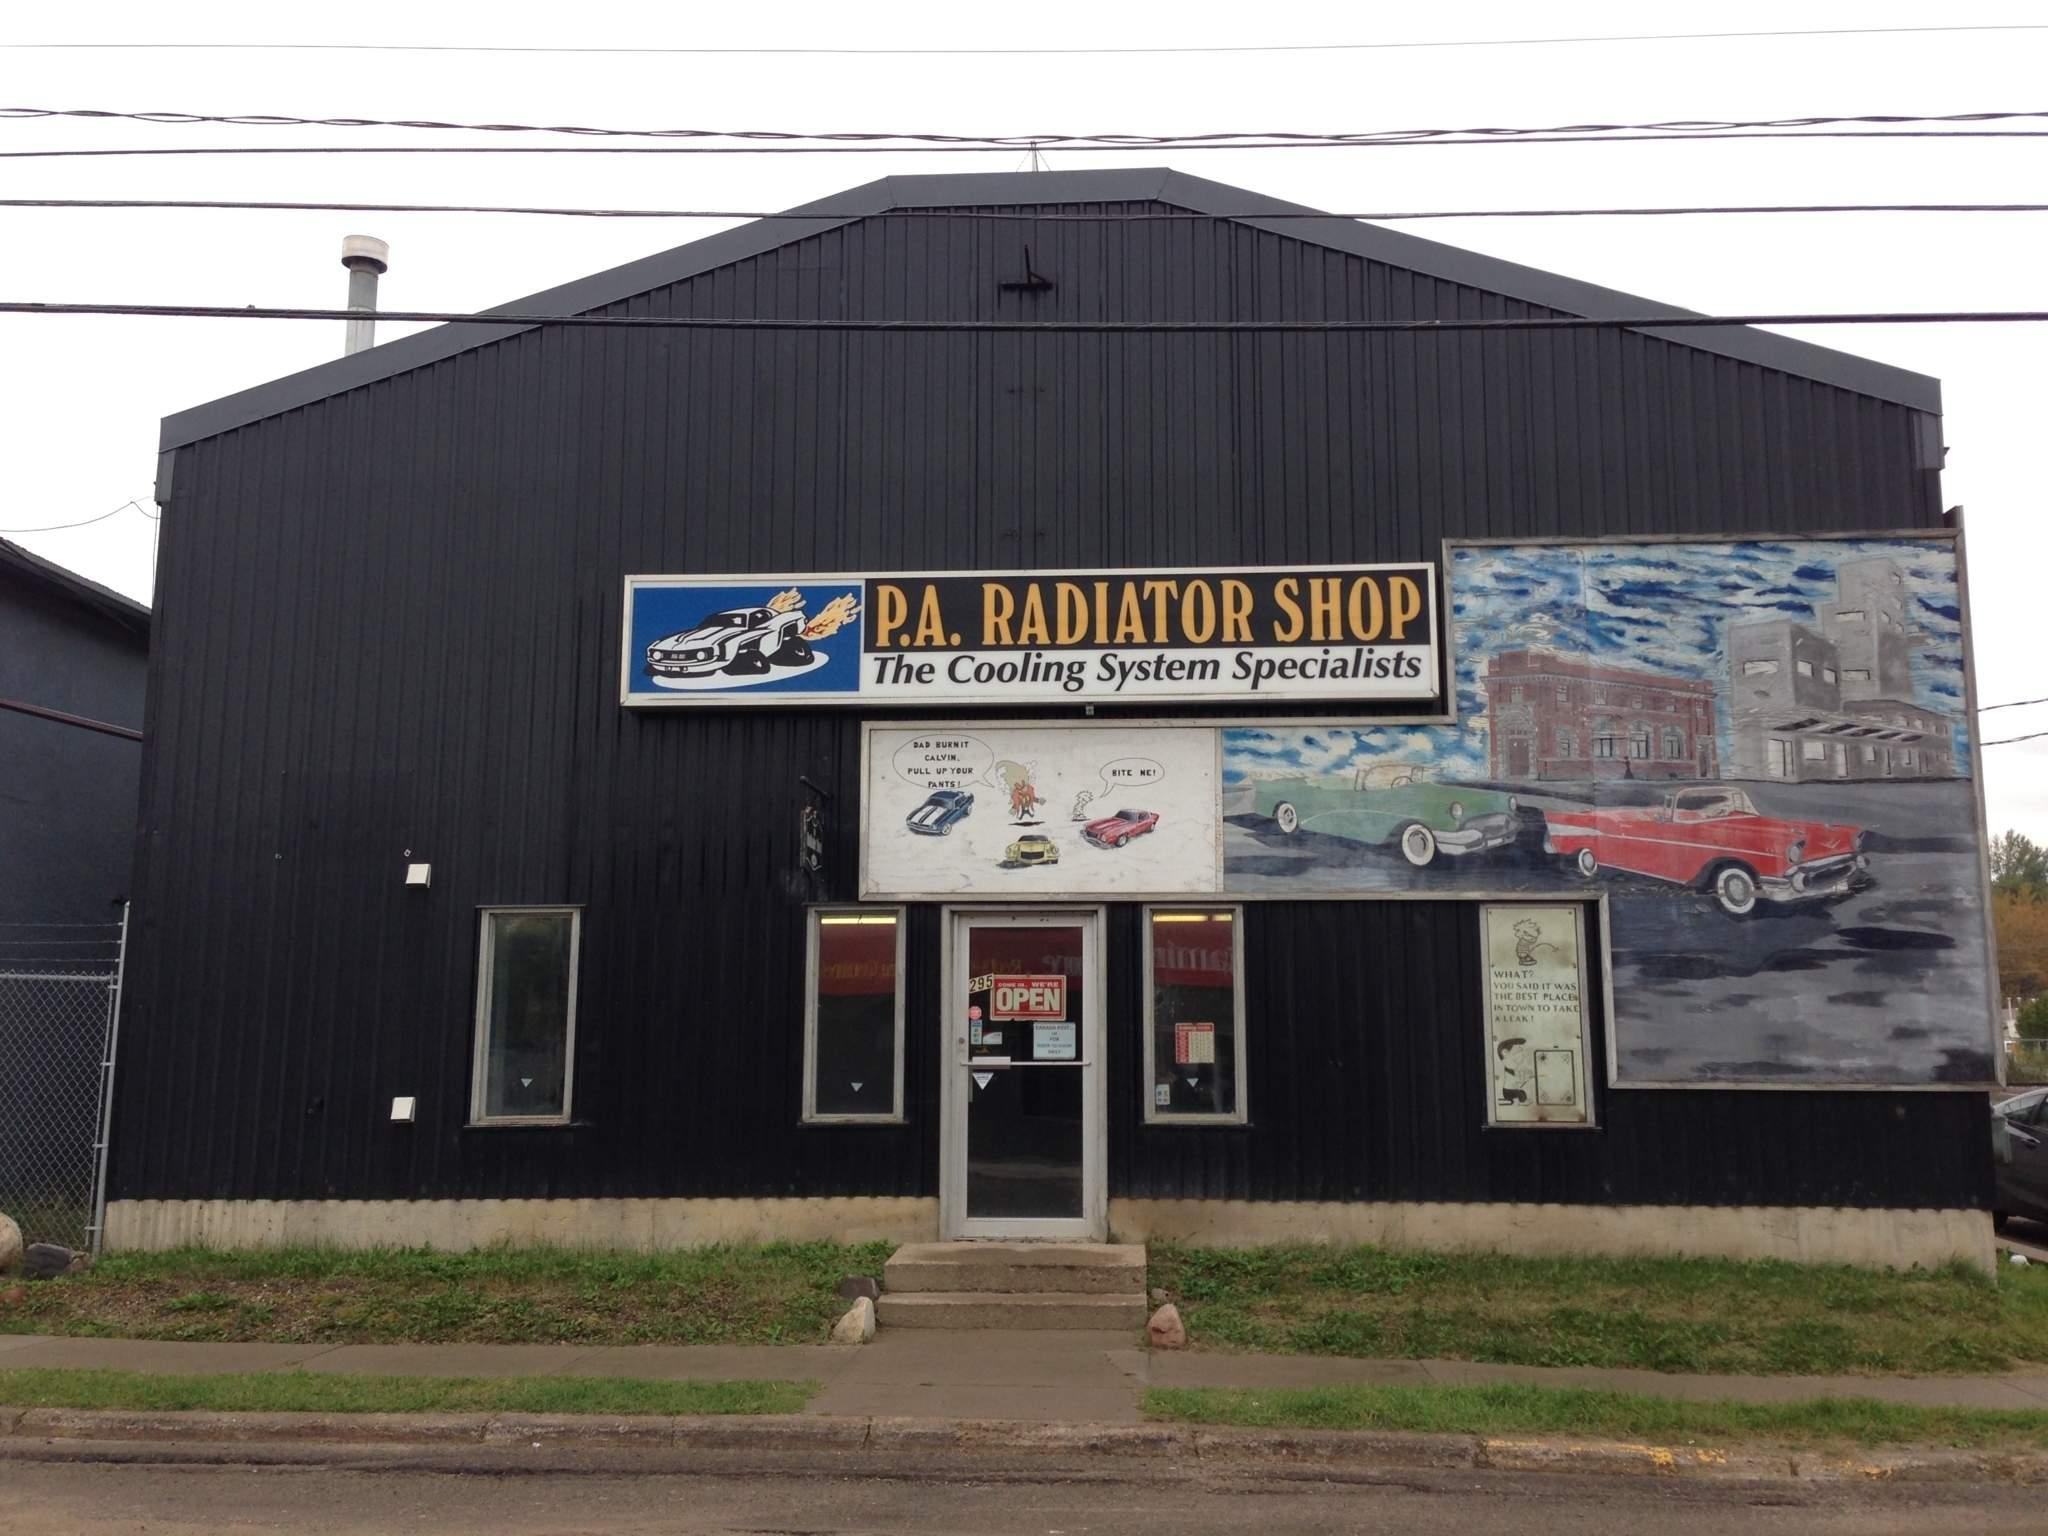 P A Radiator Shop in Prince Albert